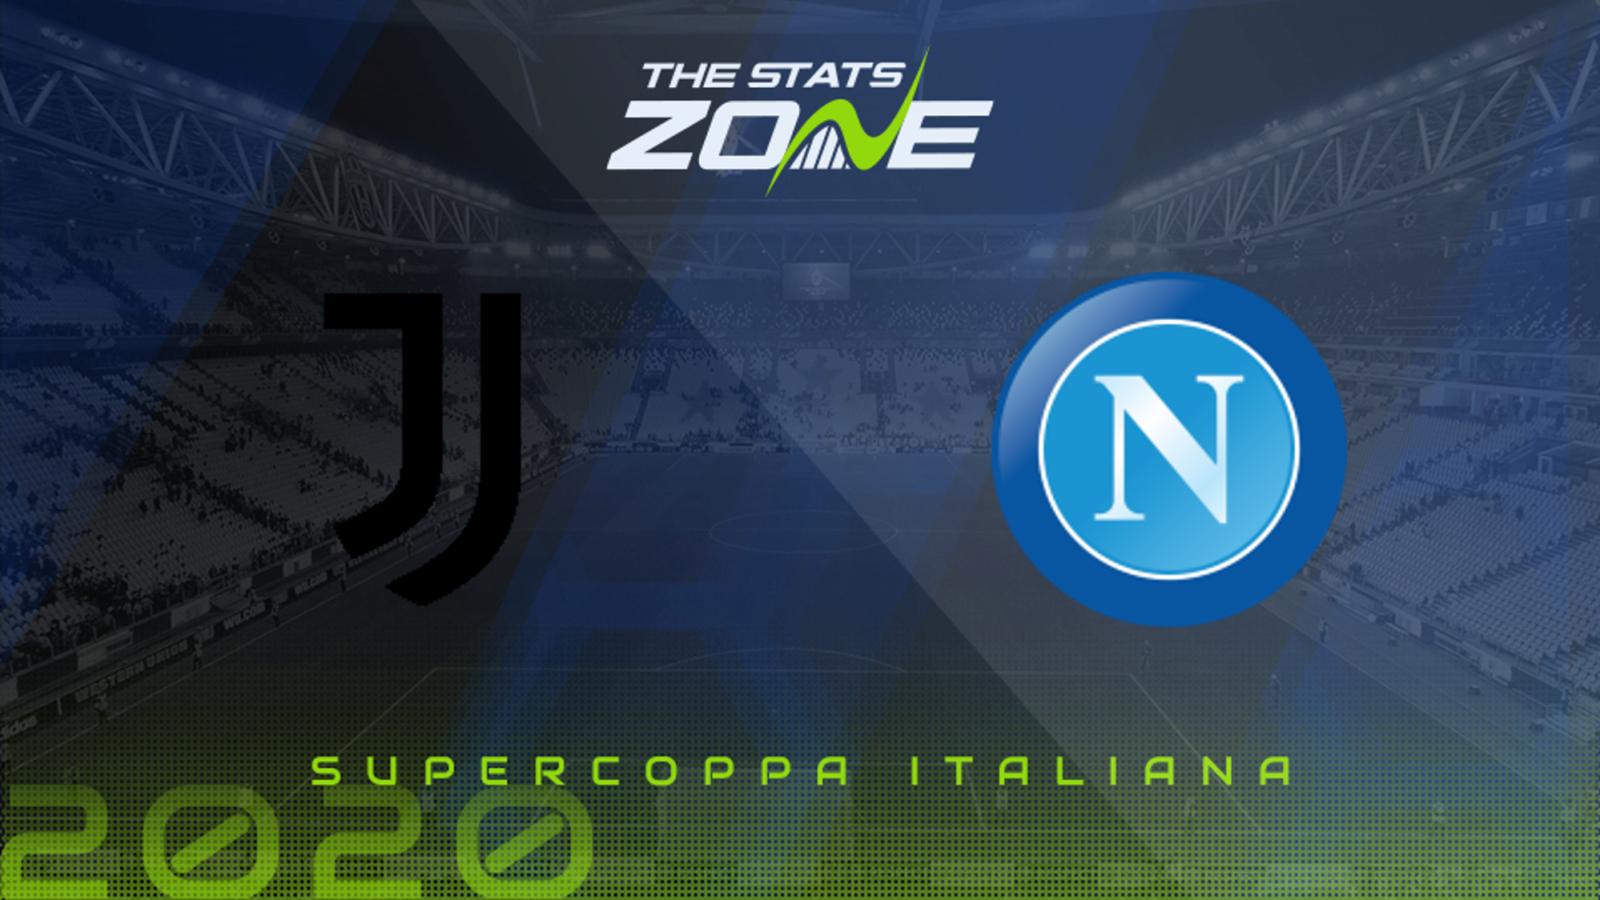 2020 Supercoppa Italiana Juventus Vs Napoli Preview Prediction The Stats Zone